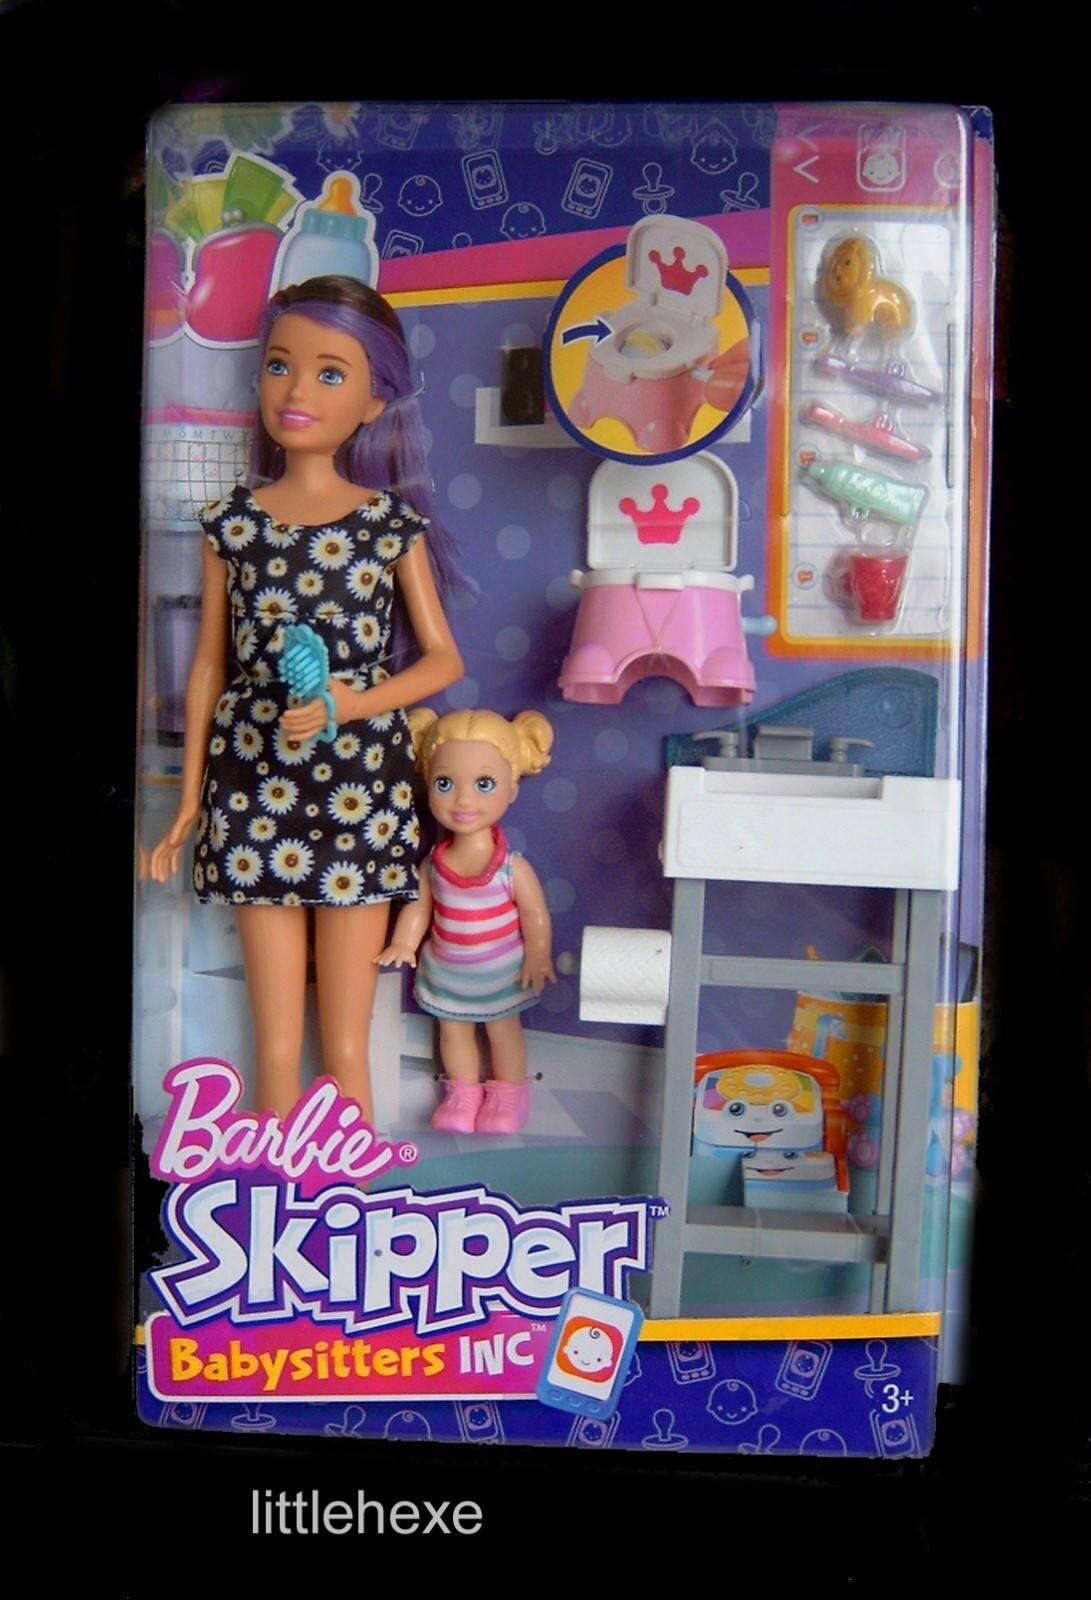 Barbie Skipper Babysitter Inc Spielset Töpfchen- Training FJB01 mega-rar NEU OVP    Hochwertige Materialien